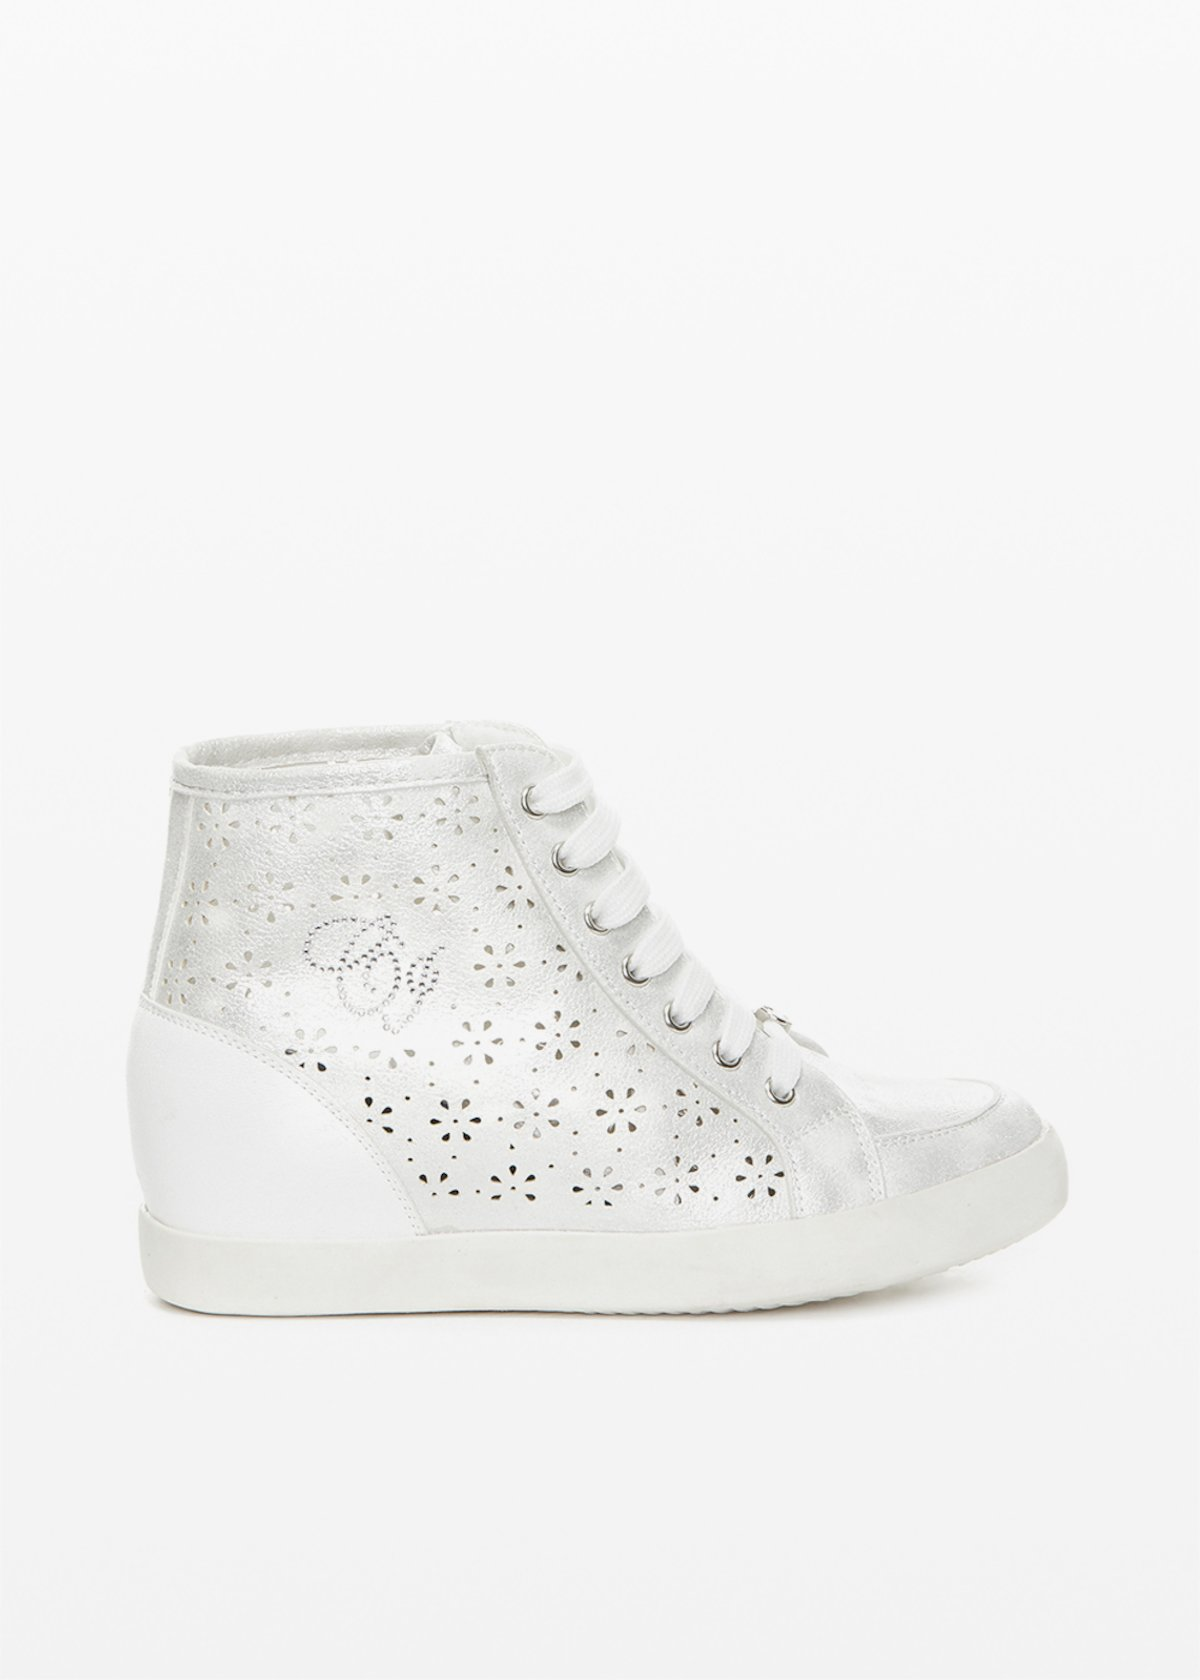 Sneakers Shery in ecopelle traforate